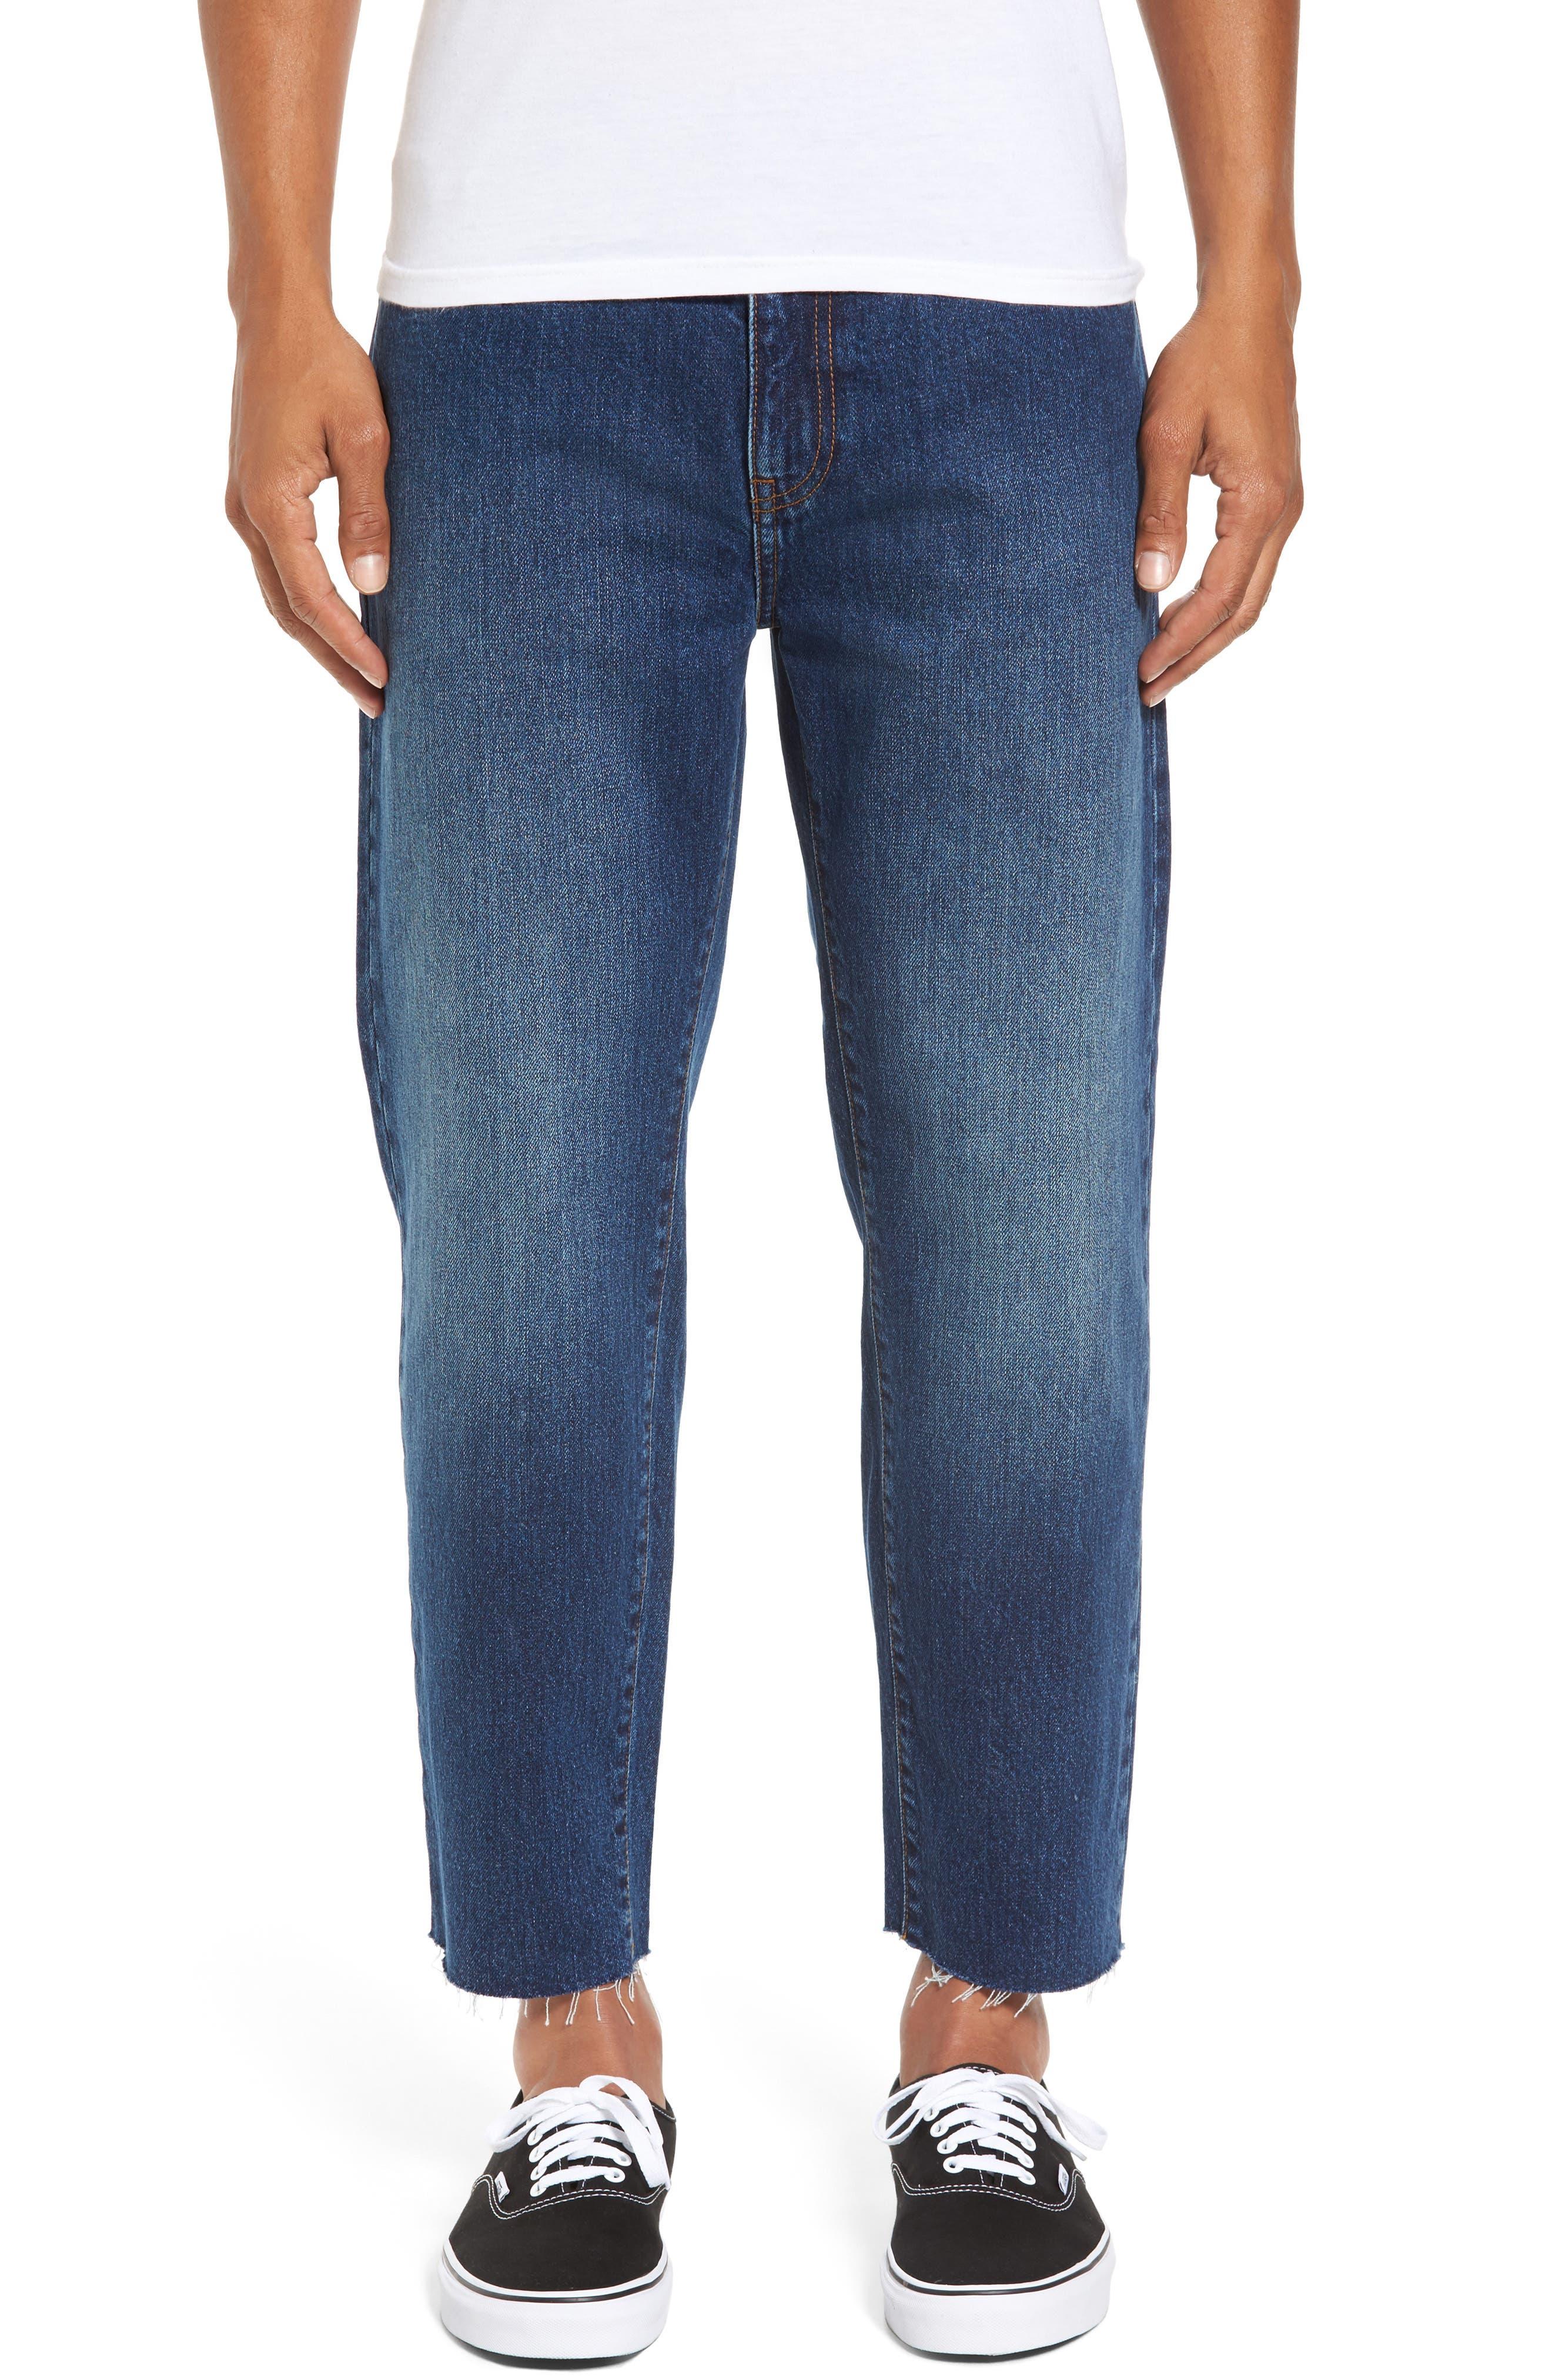 Otis Straight Fit Crop Jeans,                         Main,                         color, Worn Mid Blue Raw Hem